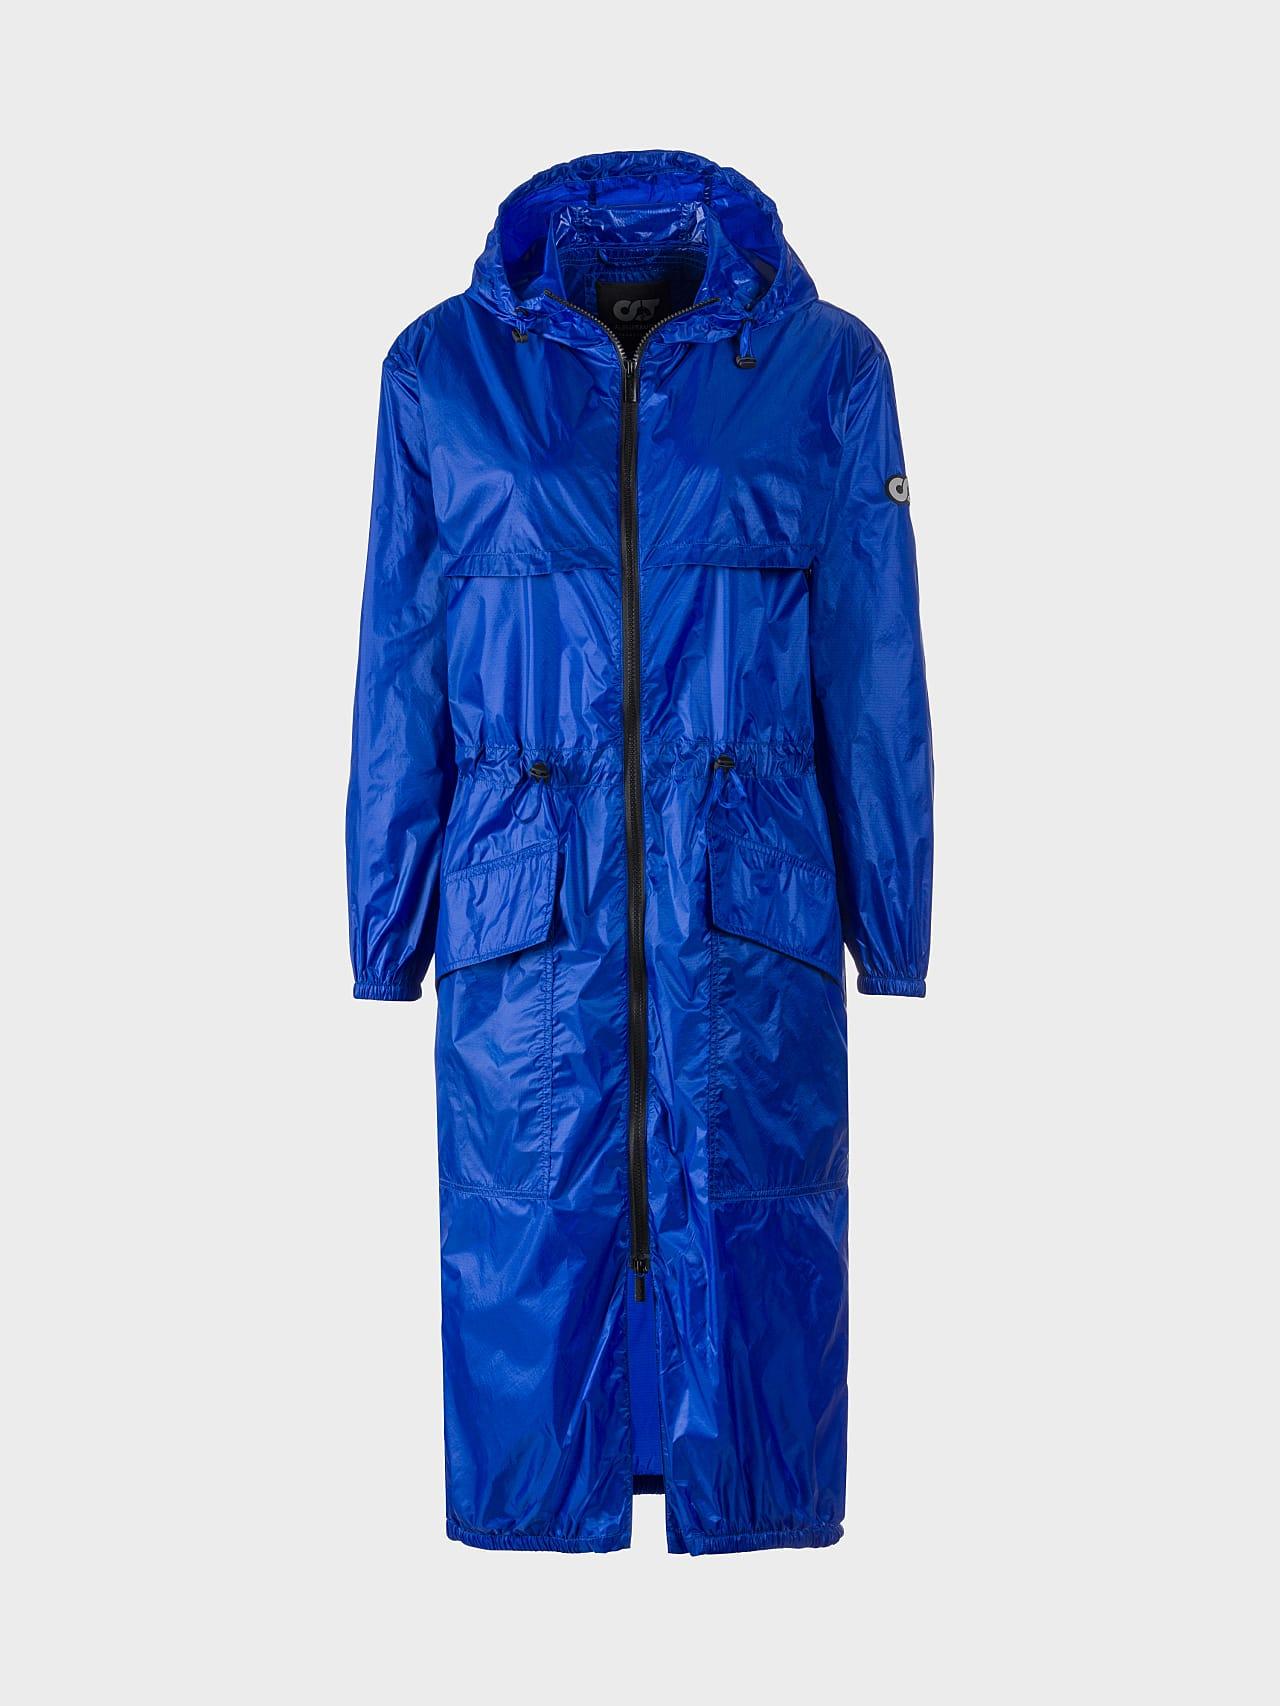 OLONO V2.Y5.01 Packable Windbreaker Coat blue Back Alpha Tauri